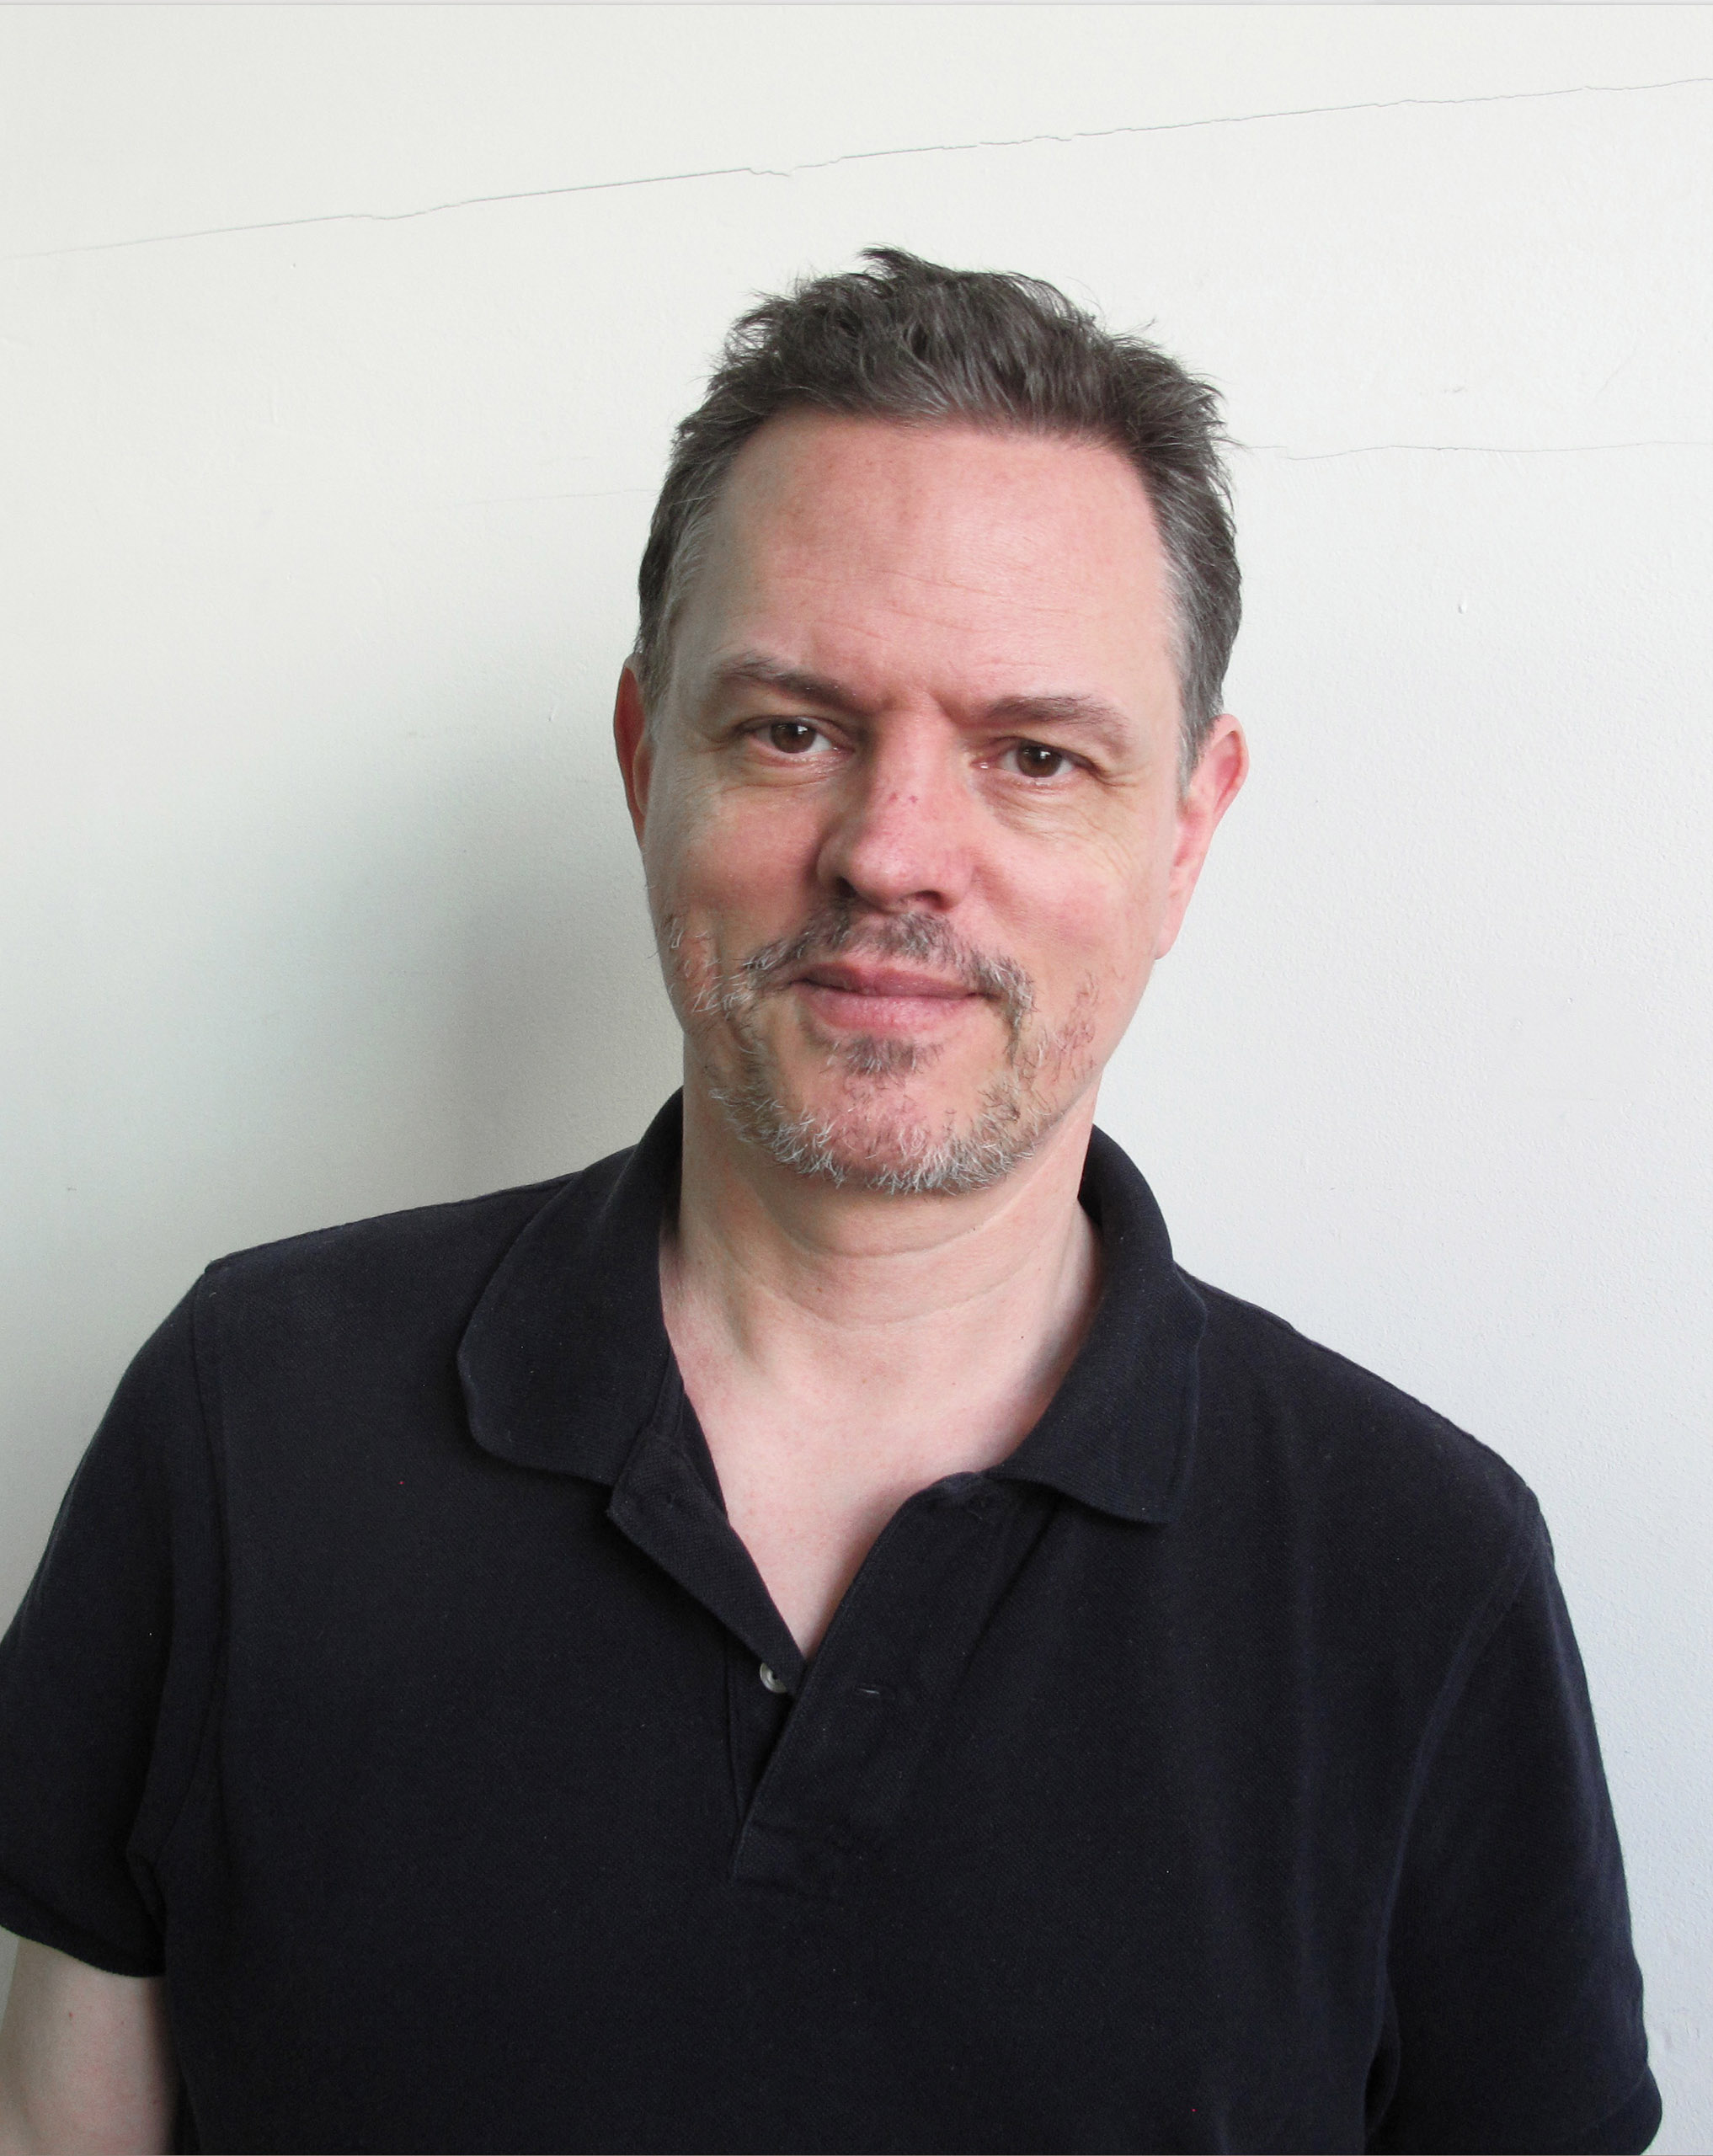 Robert Lazzarini